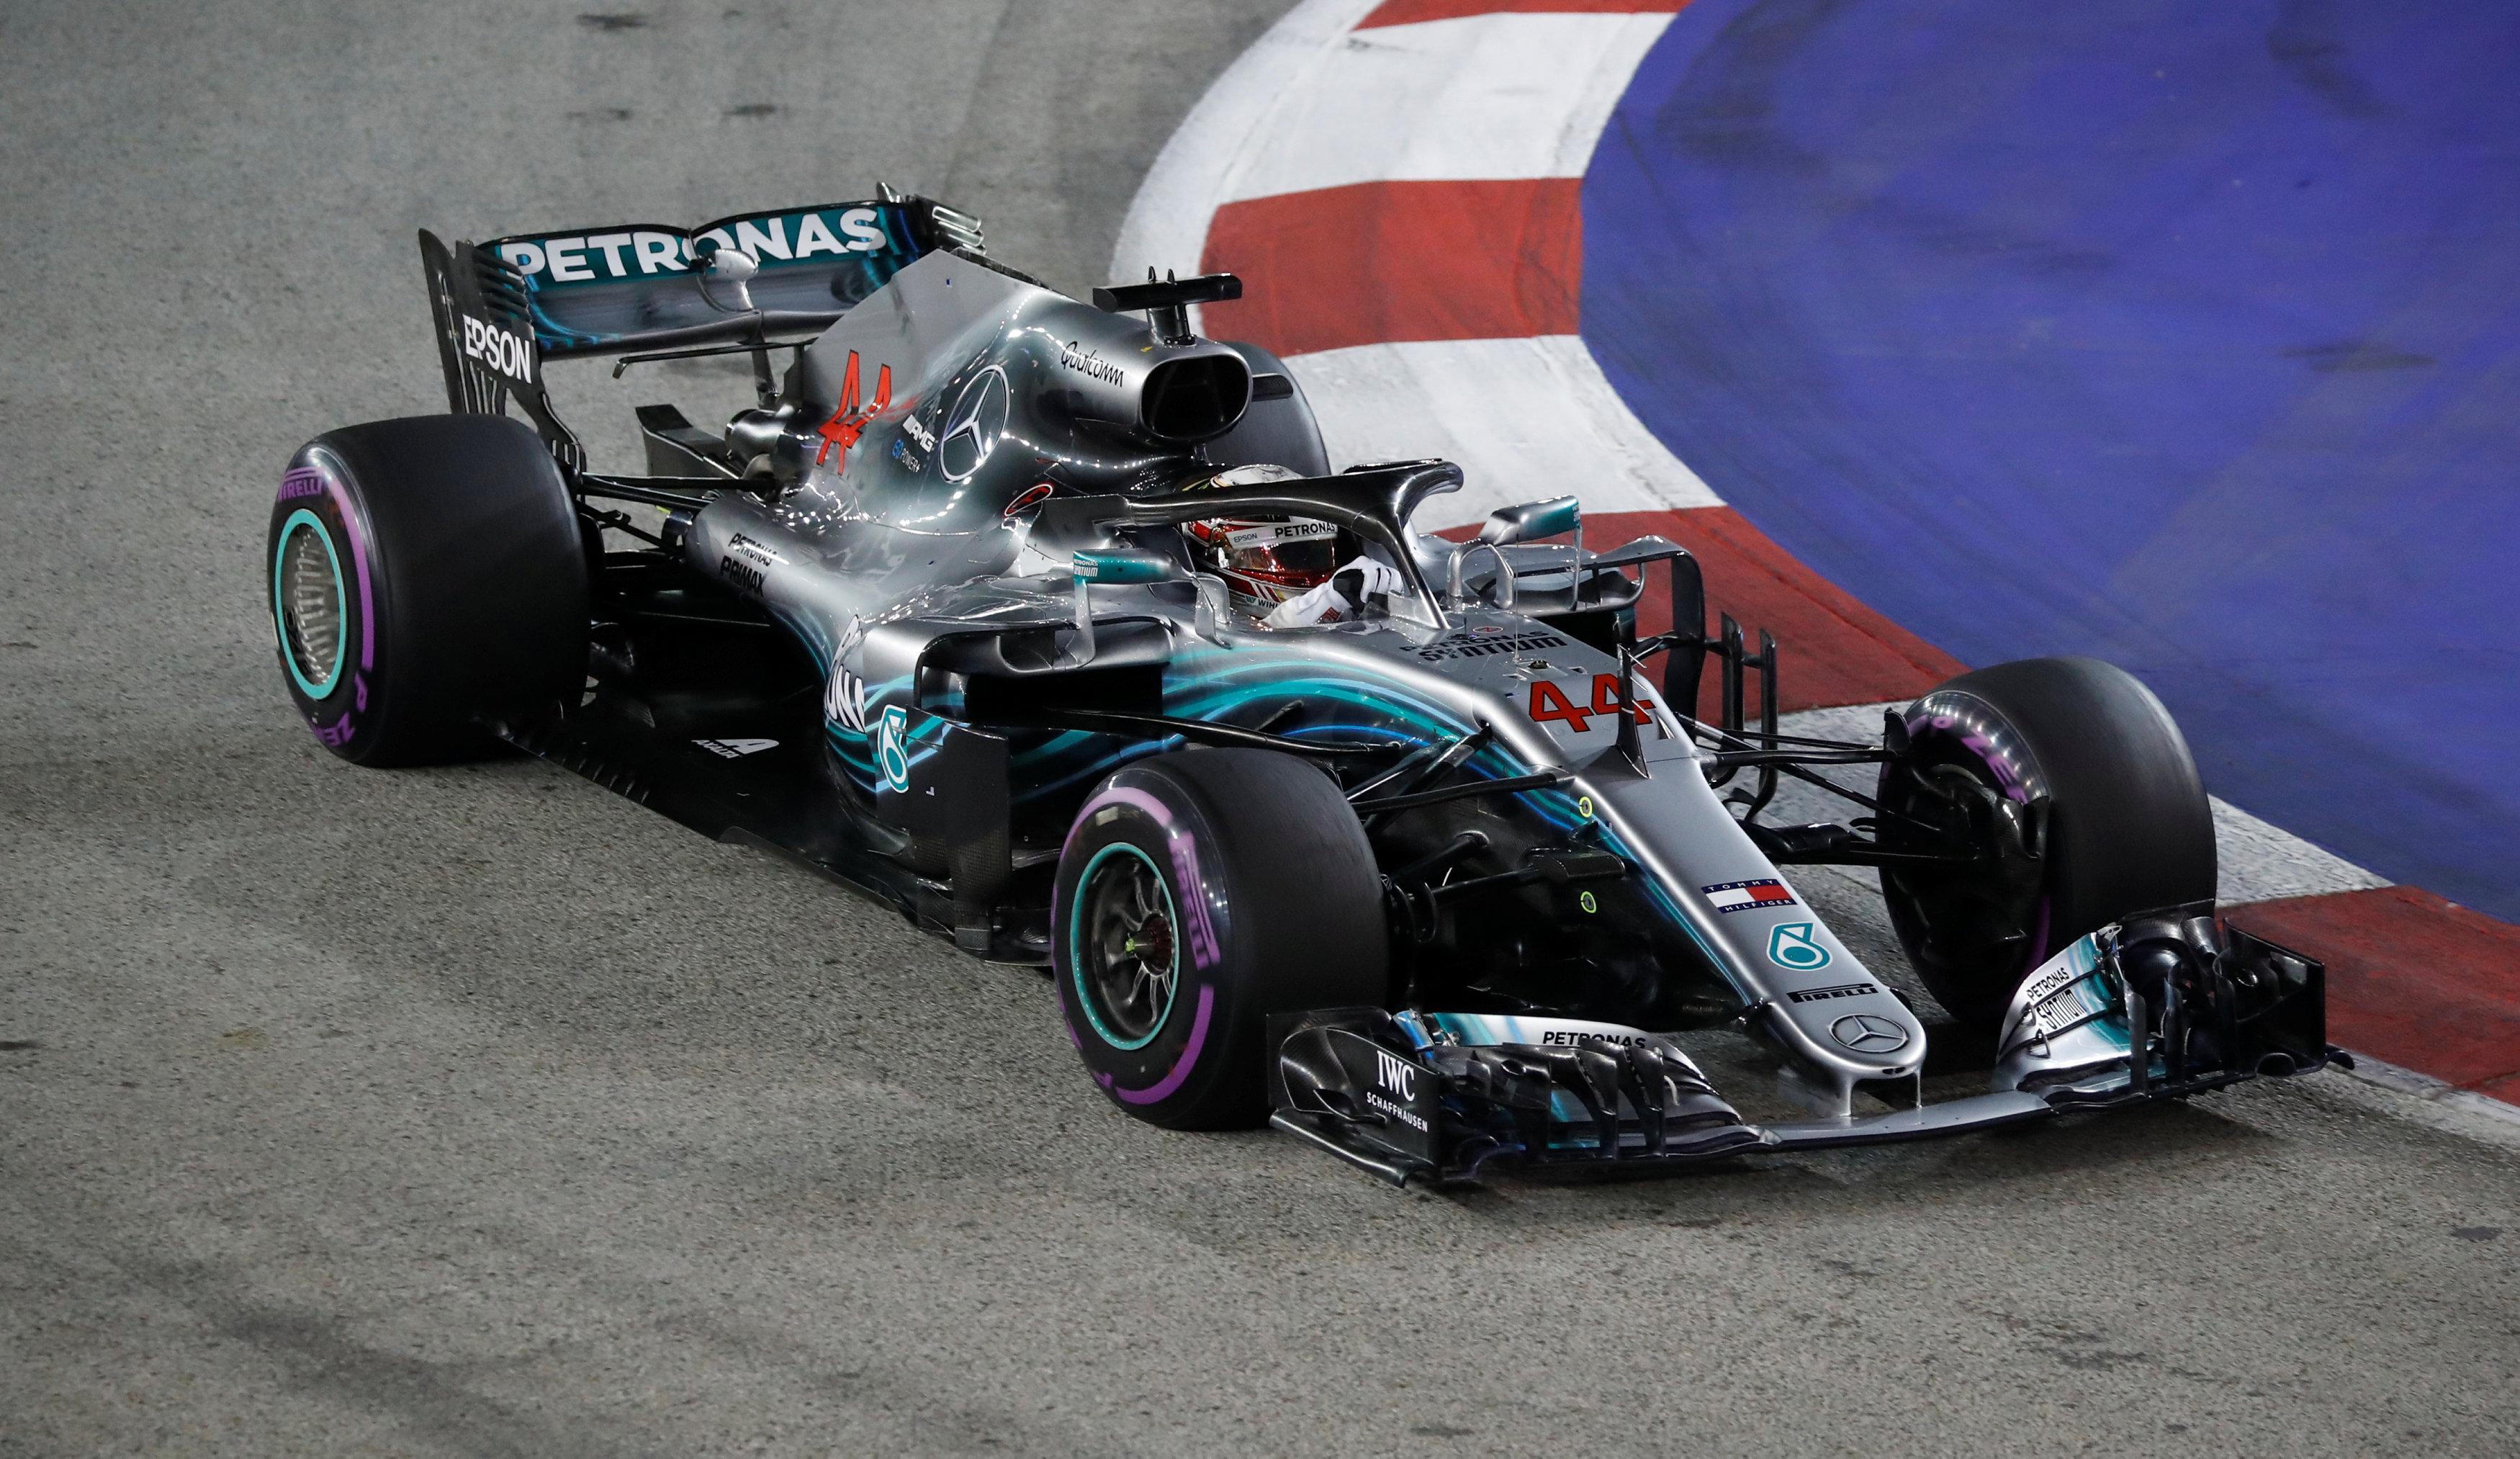 Hamilton stormed to a brilliant Singapore GP pole